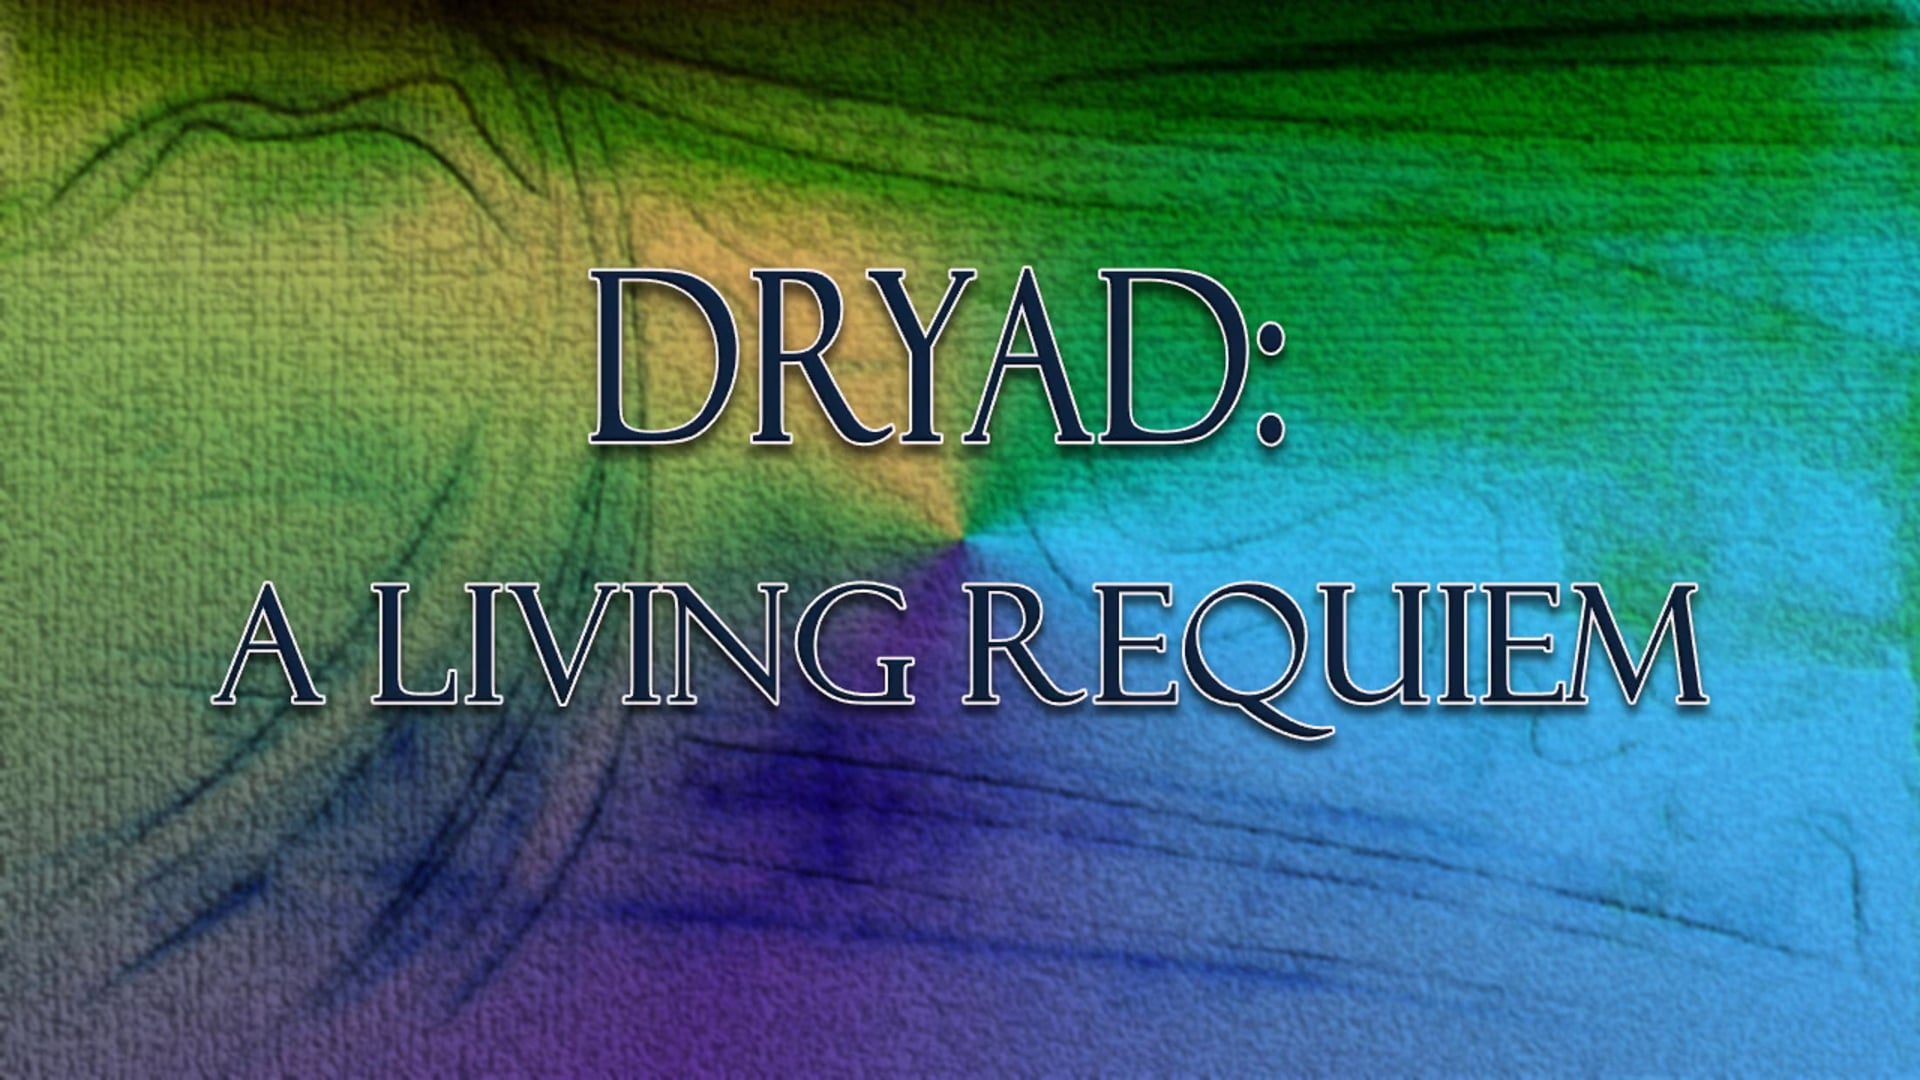 DRYAD: A LIVING REQUIEM